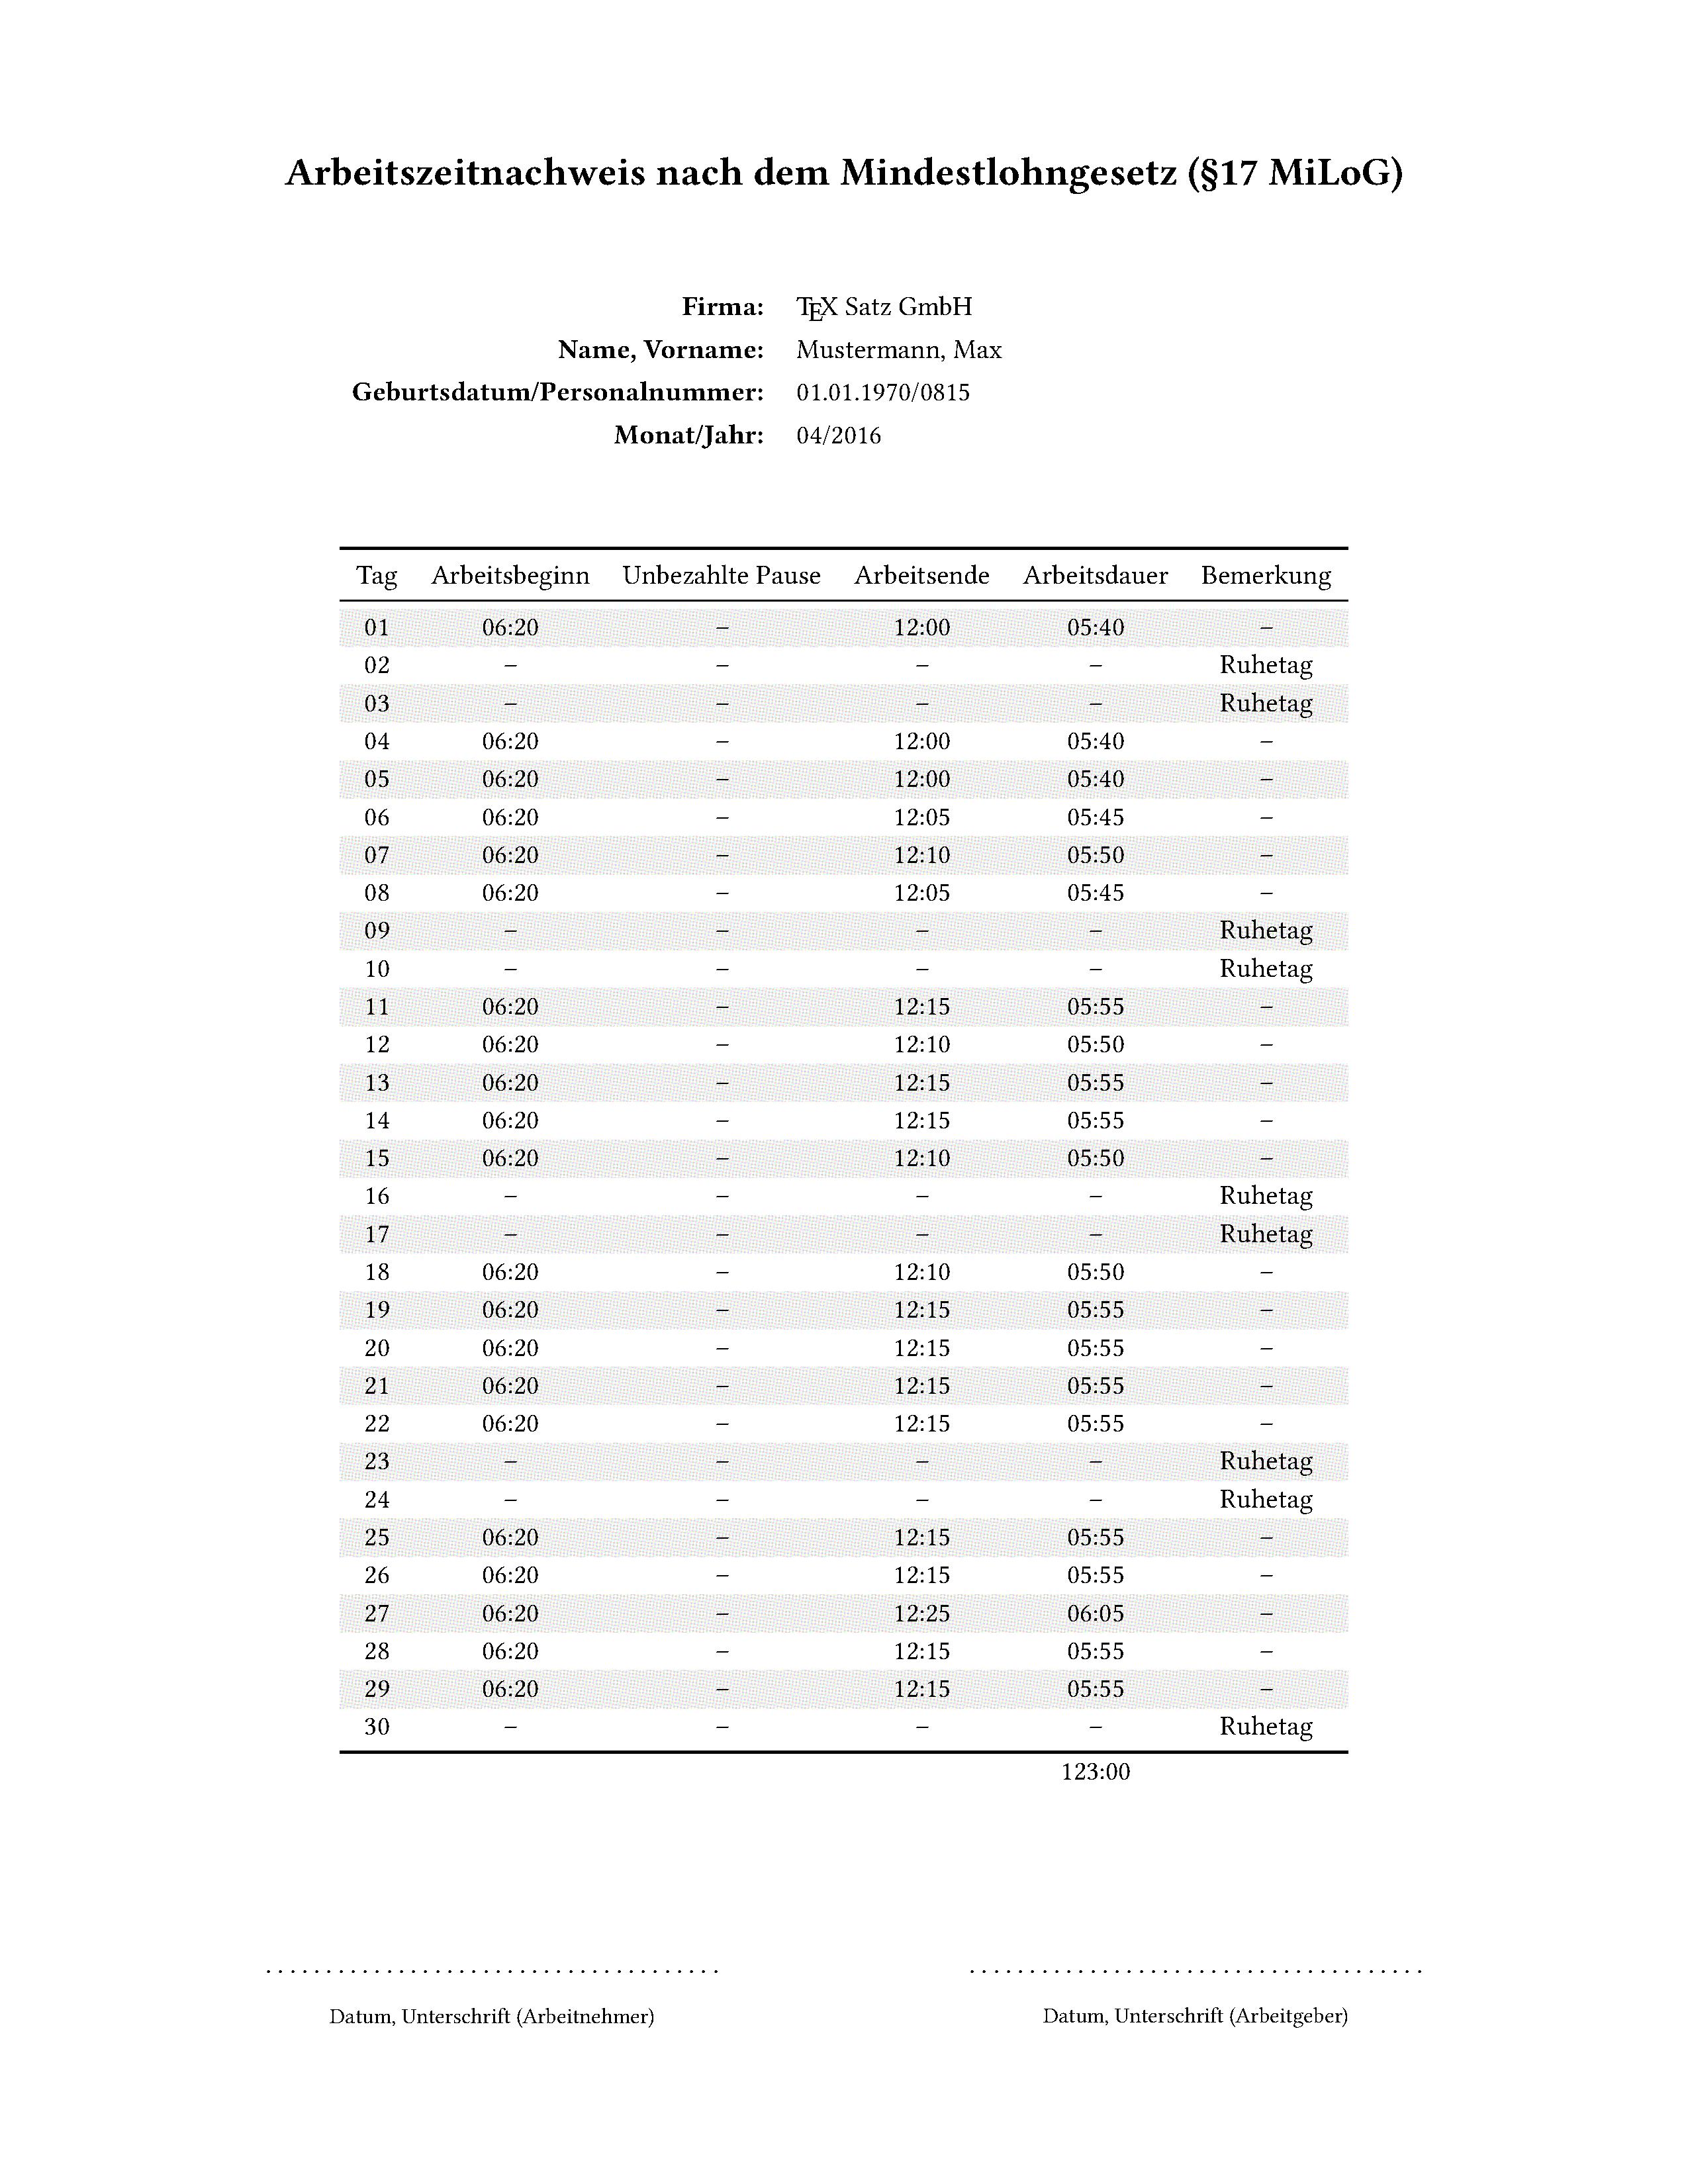 milog.pdf